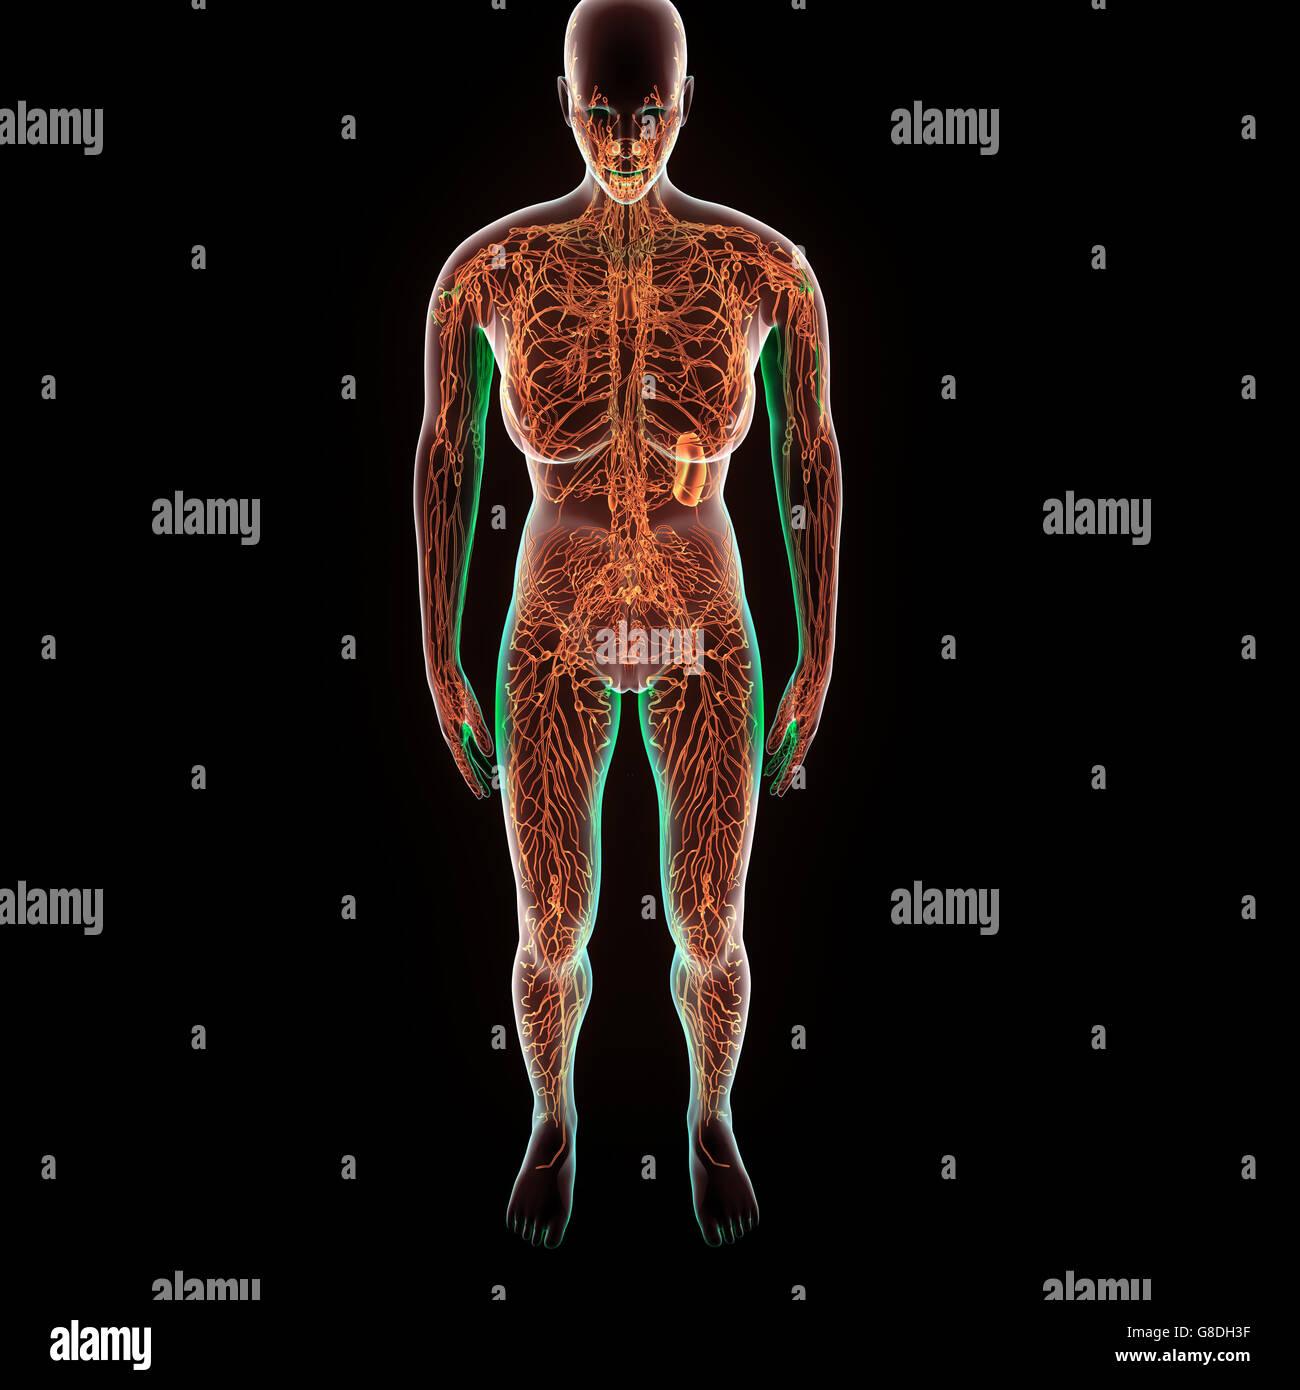 3d illustration of human body Nervous System anatomy Stock Photo ...